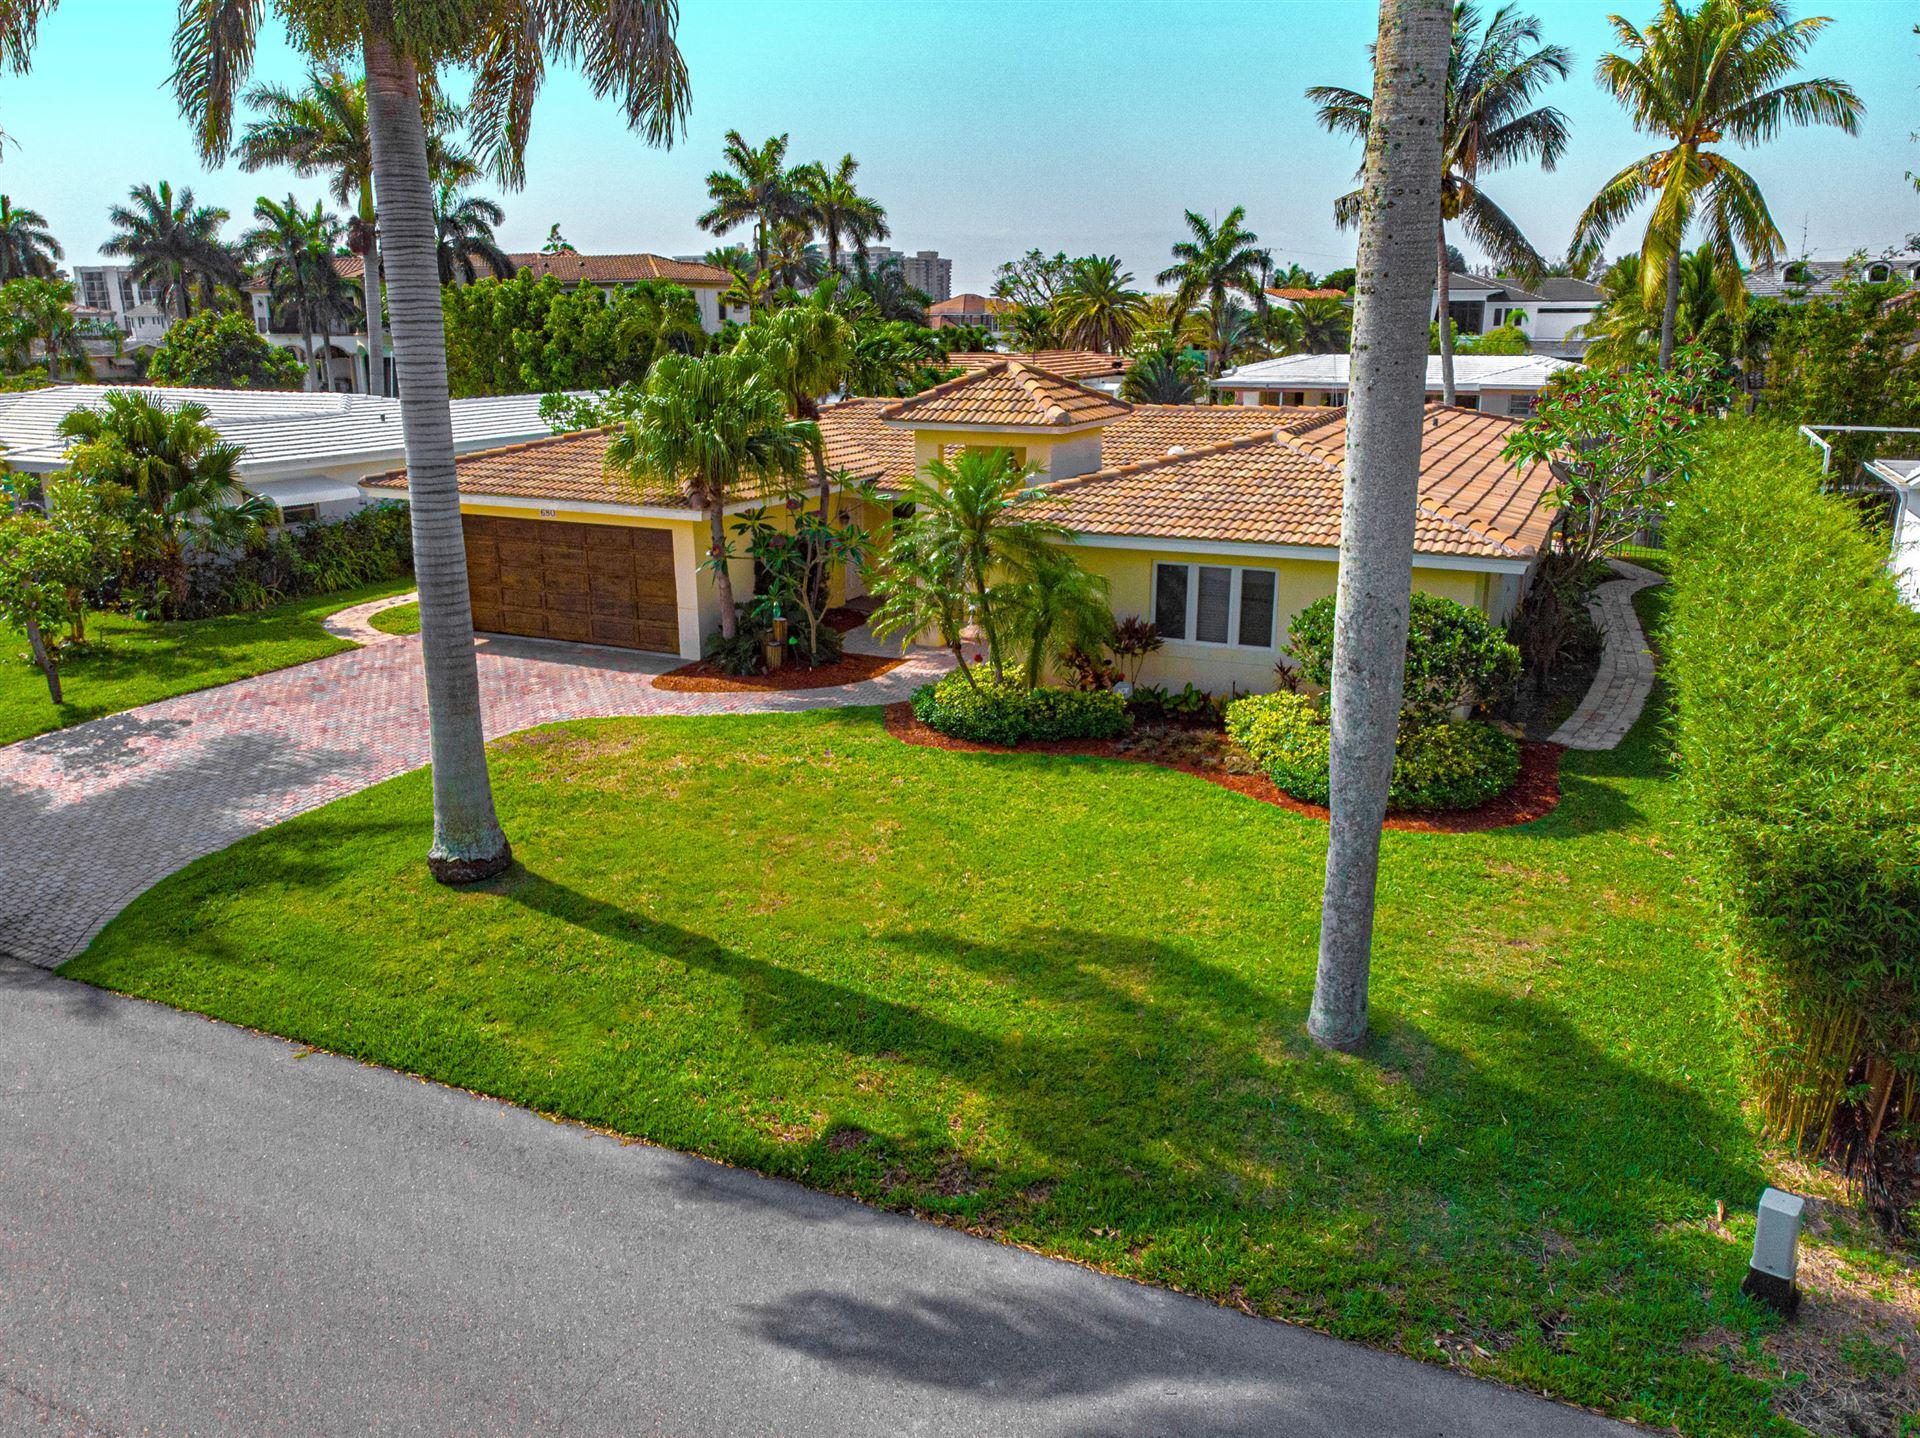 680 NE Marine Drive, Boca Raton, FL 33431 - #: RX-10618530